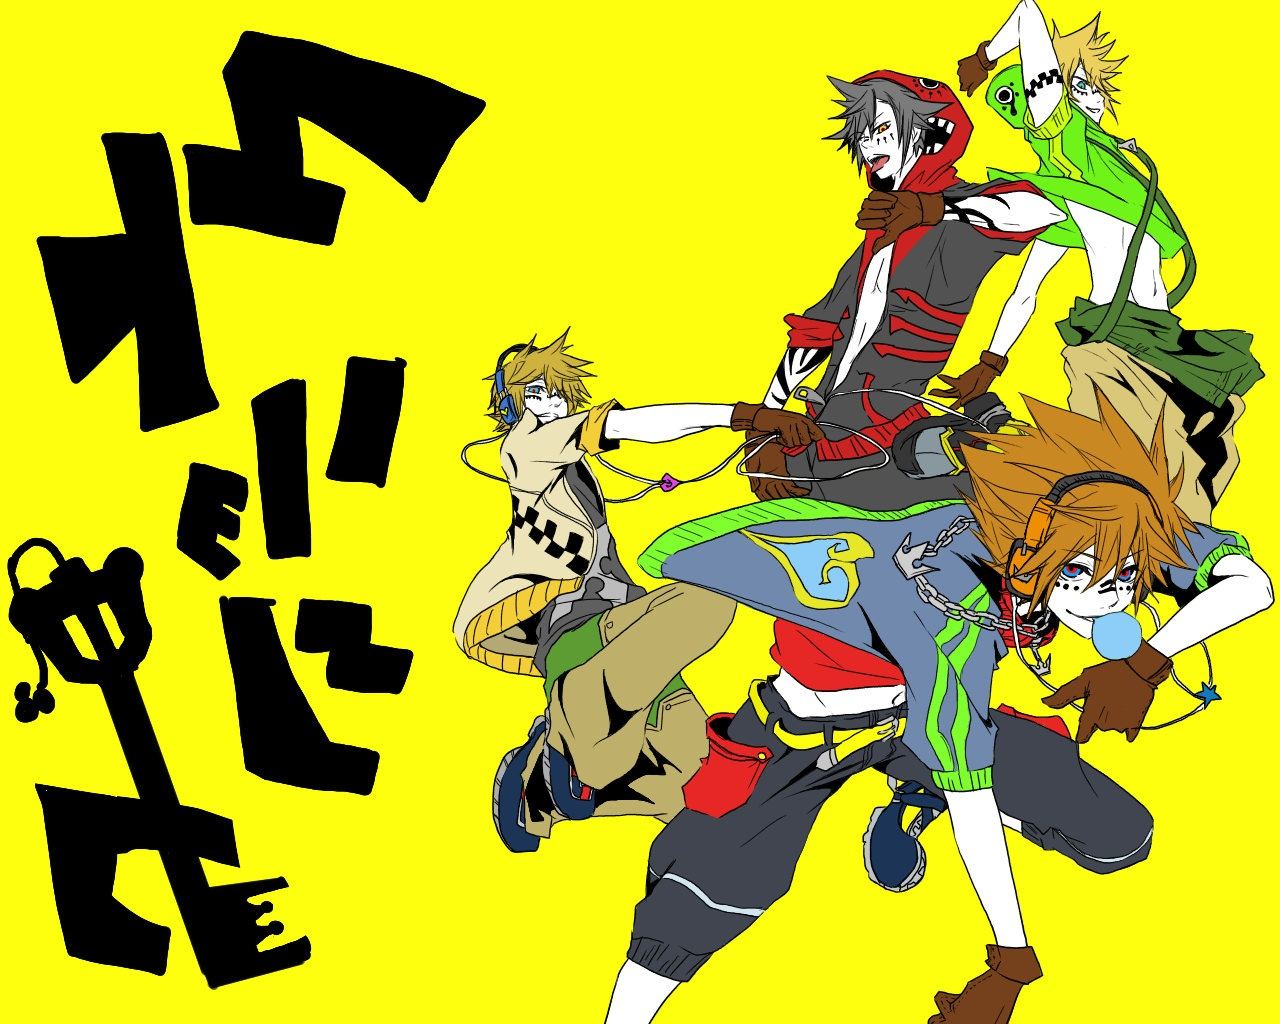 kingdom hearts image 686997 zerochan anime image board